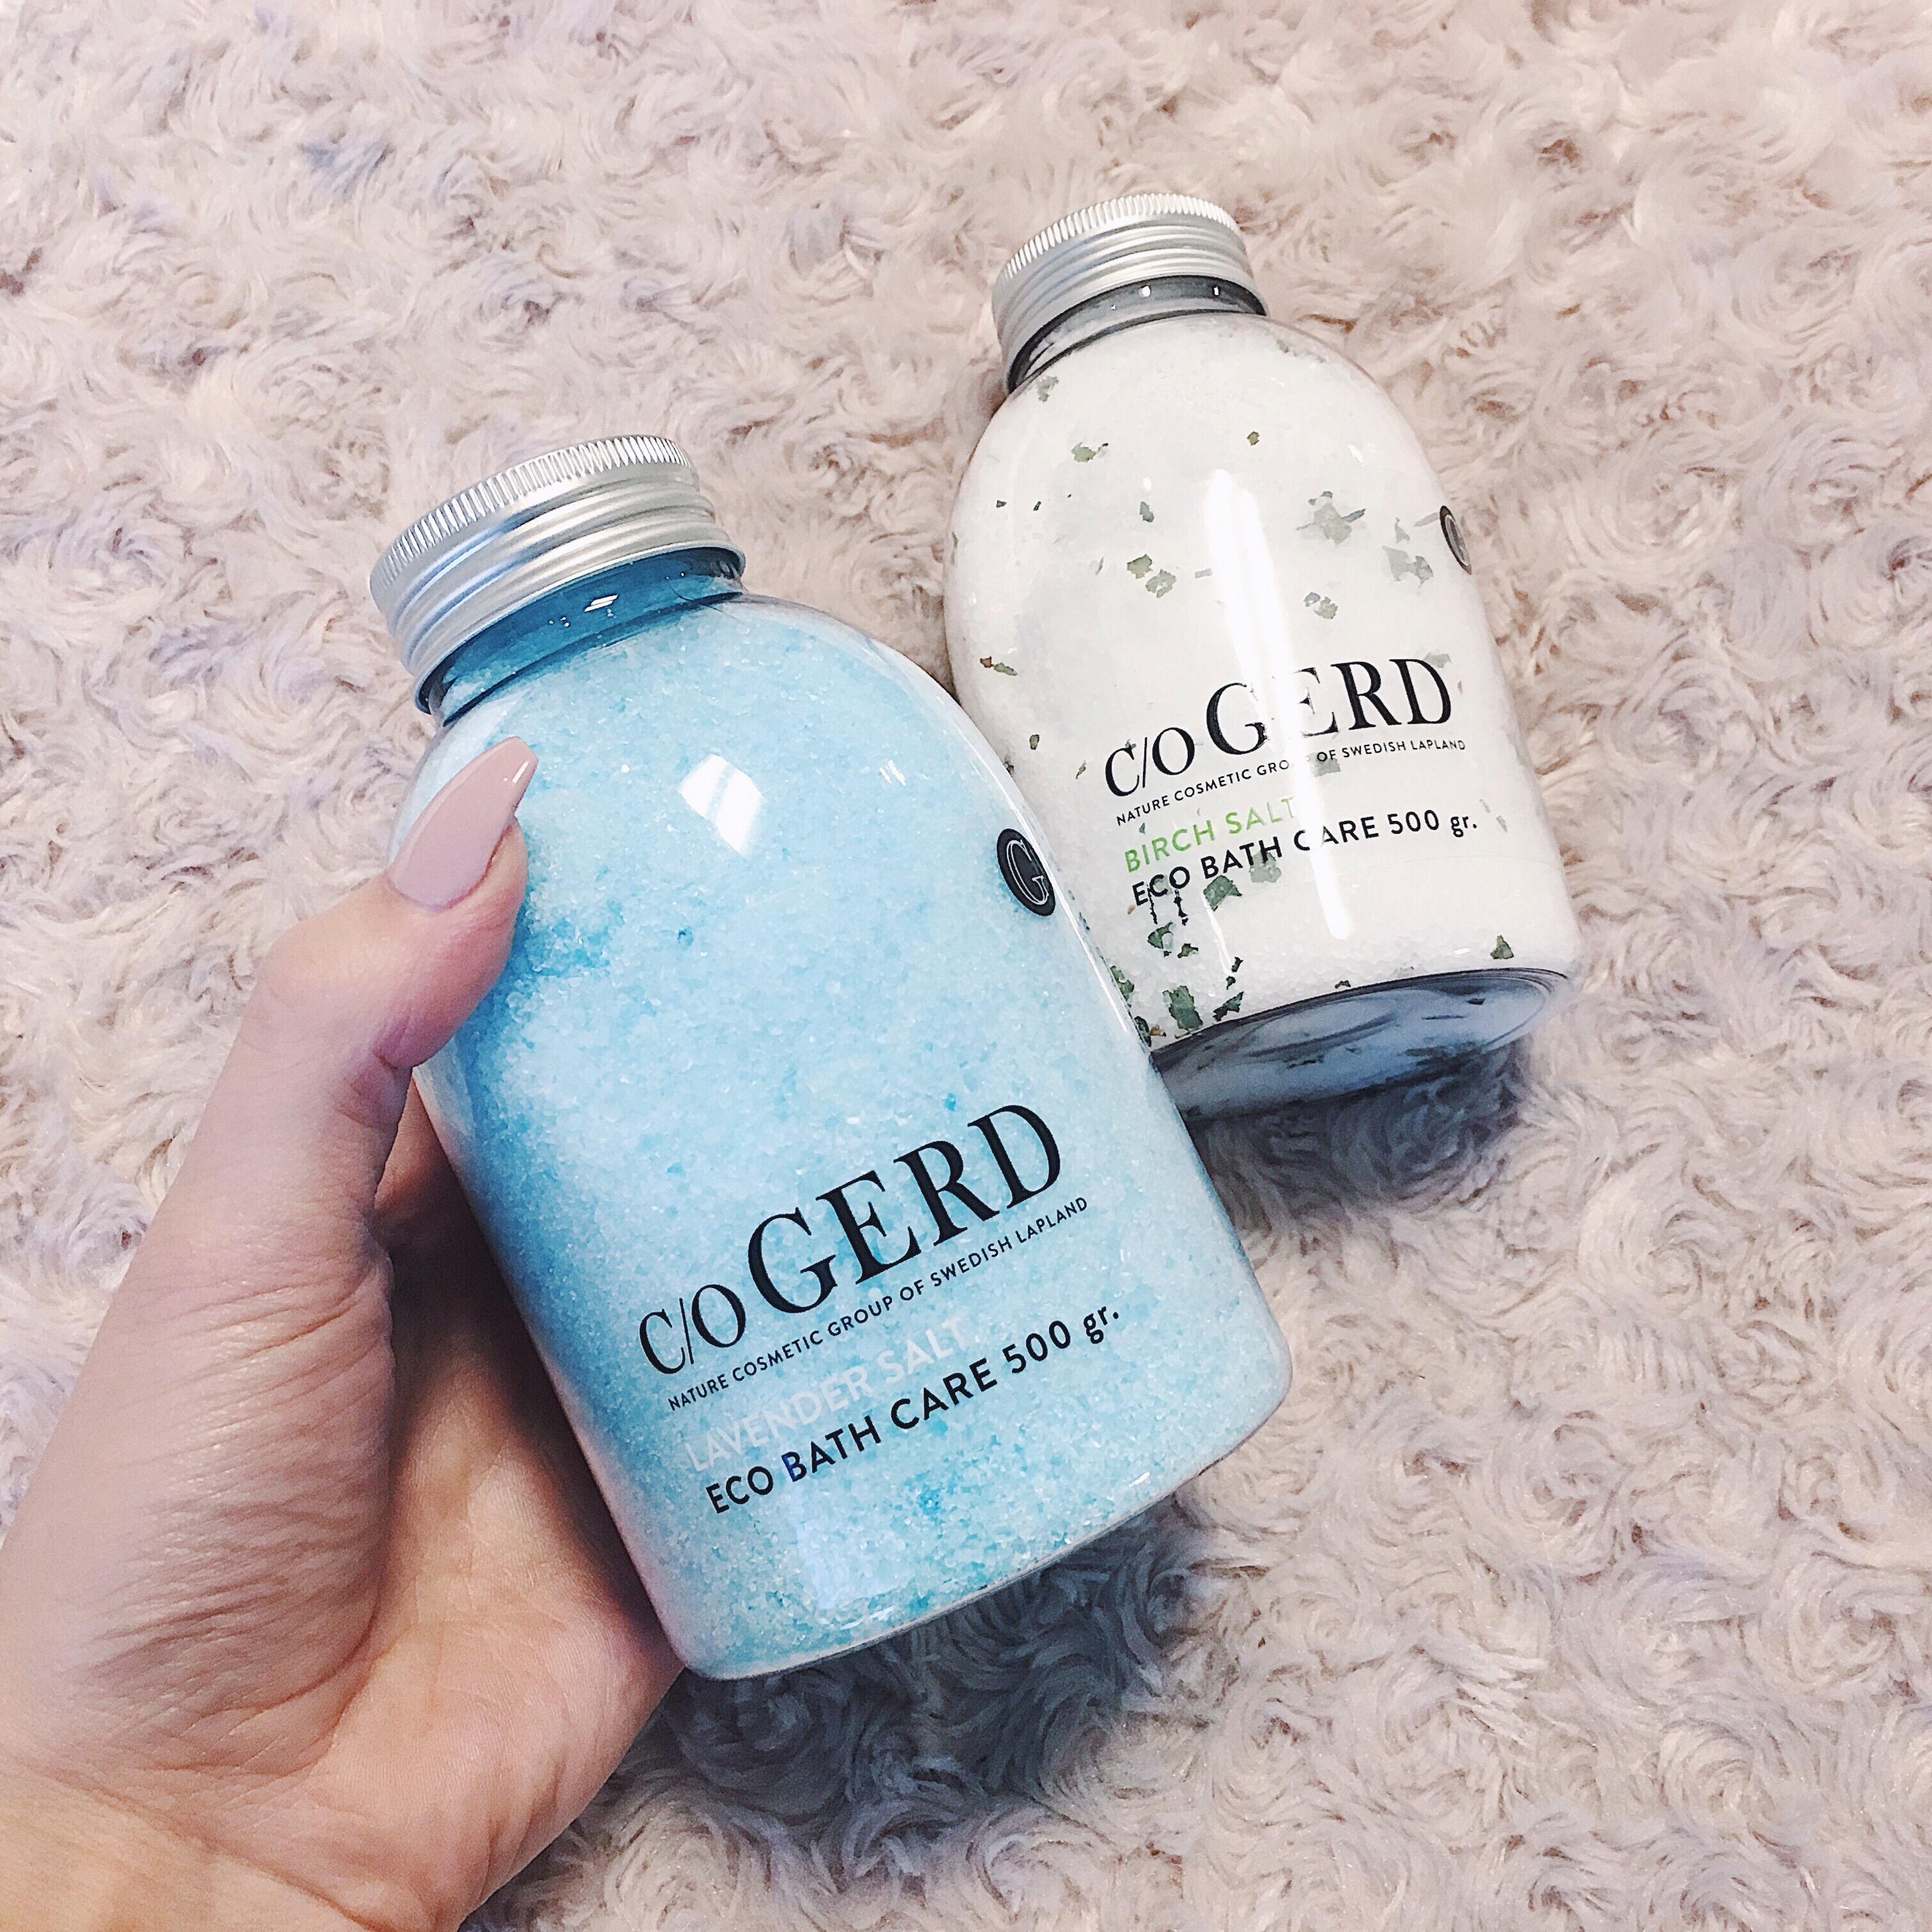 badsalt - Care of gerd